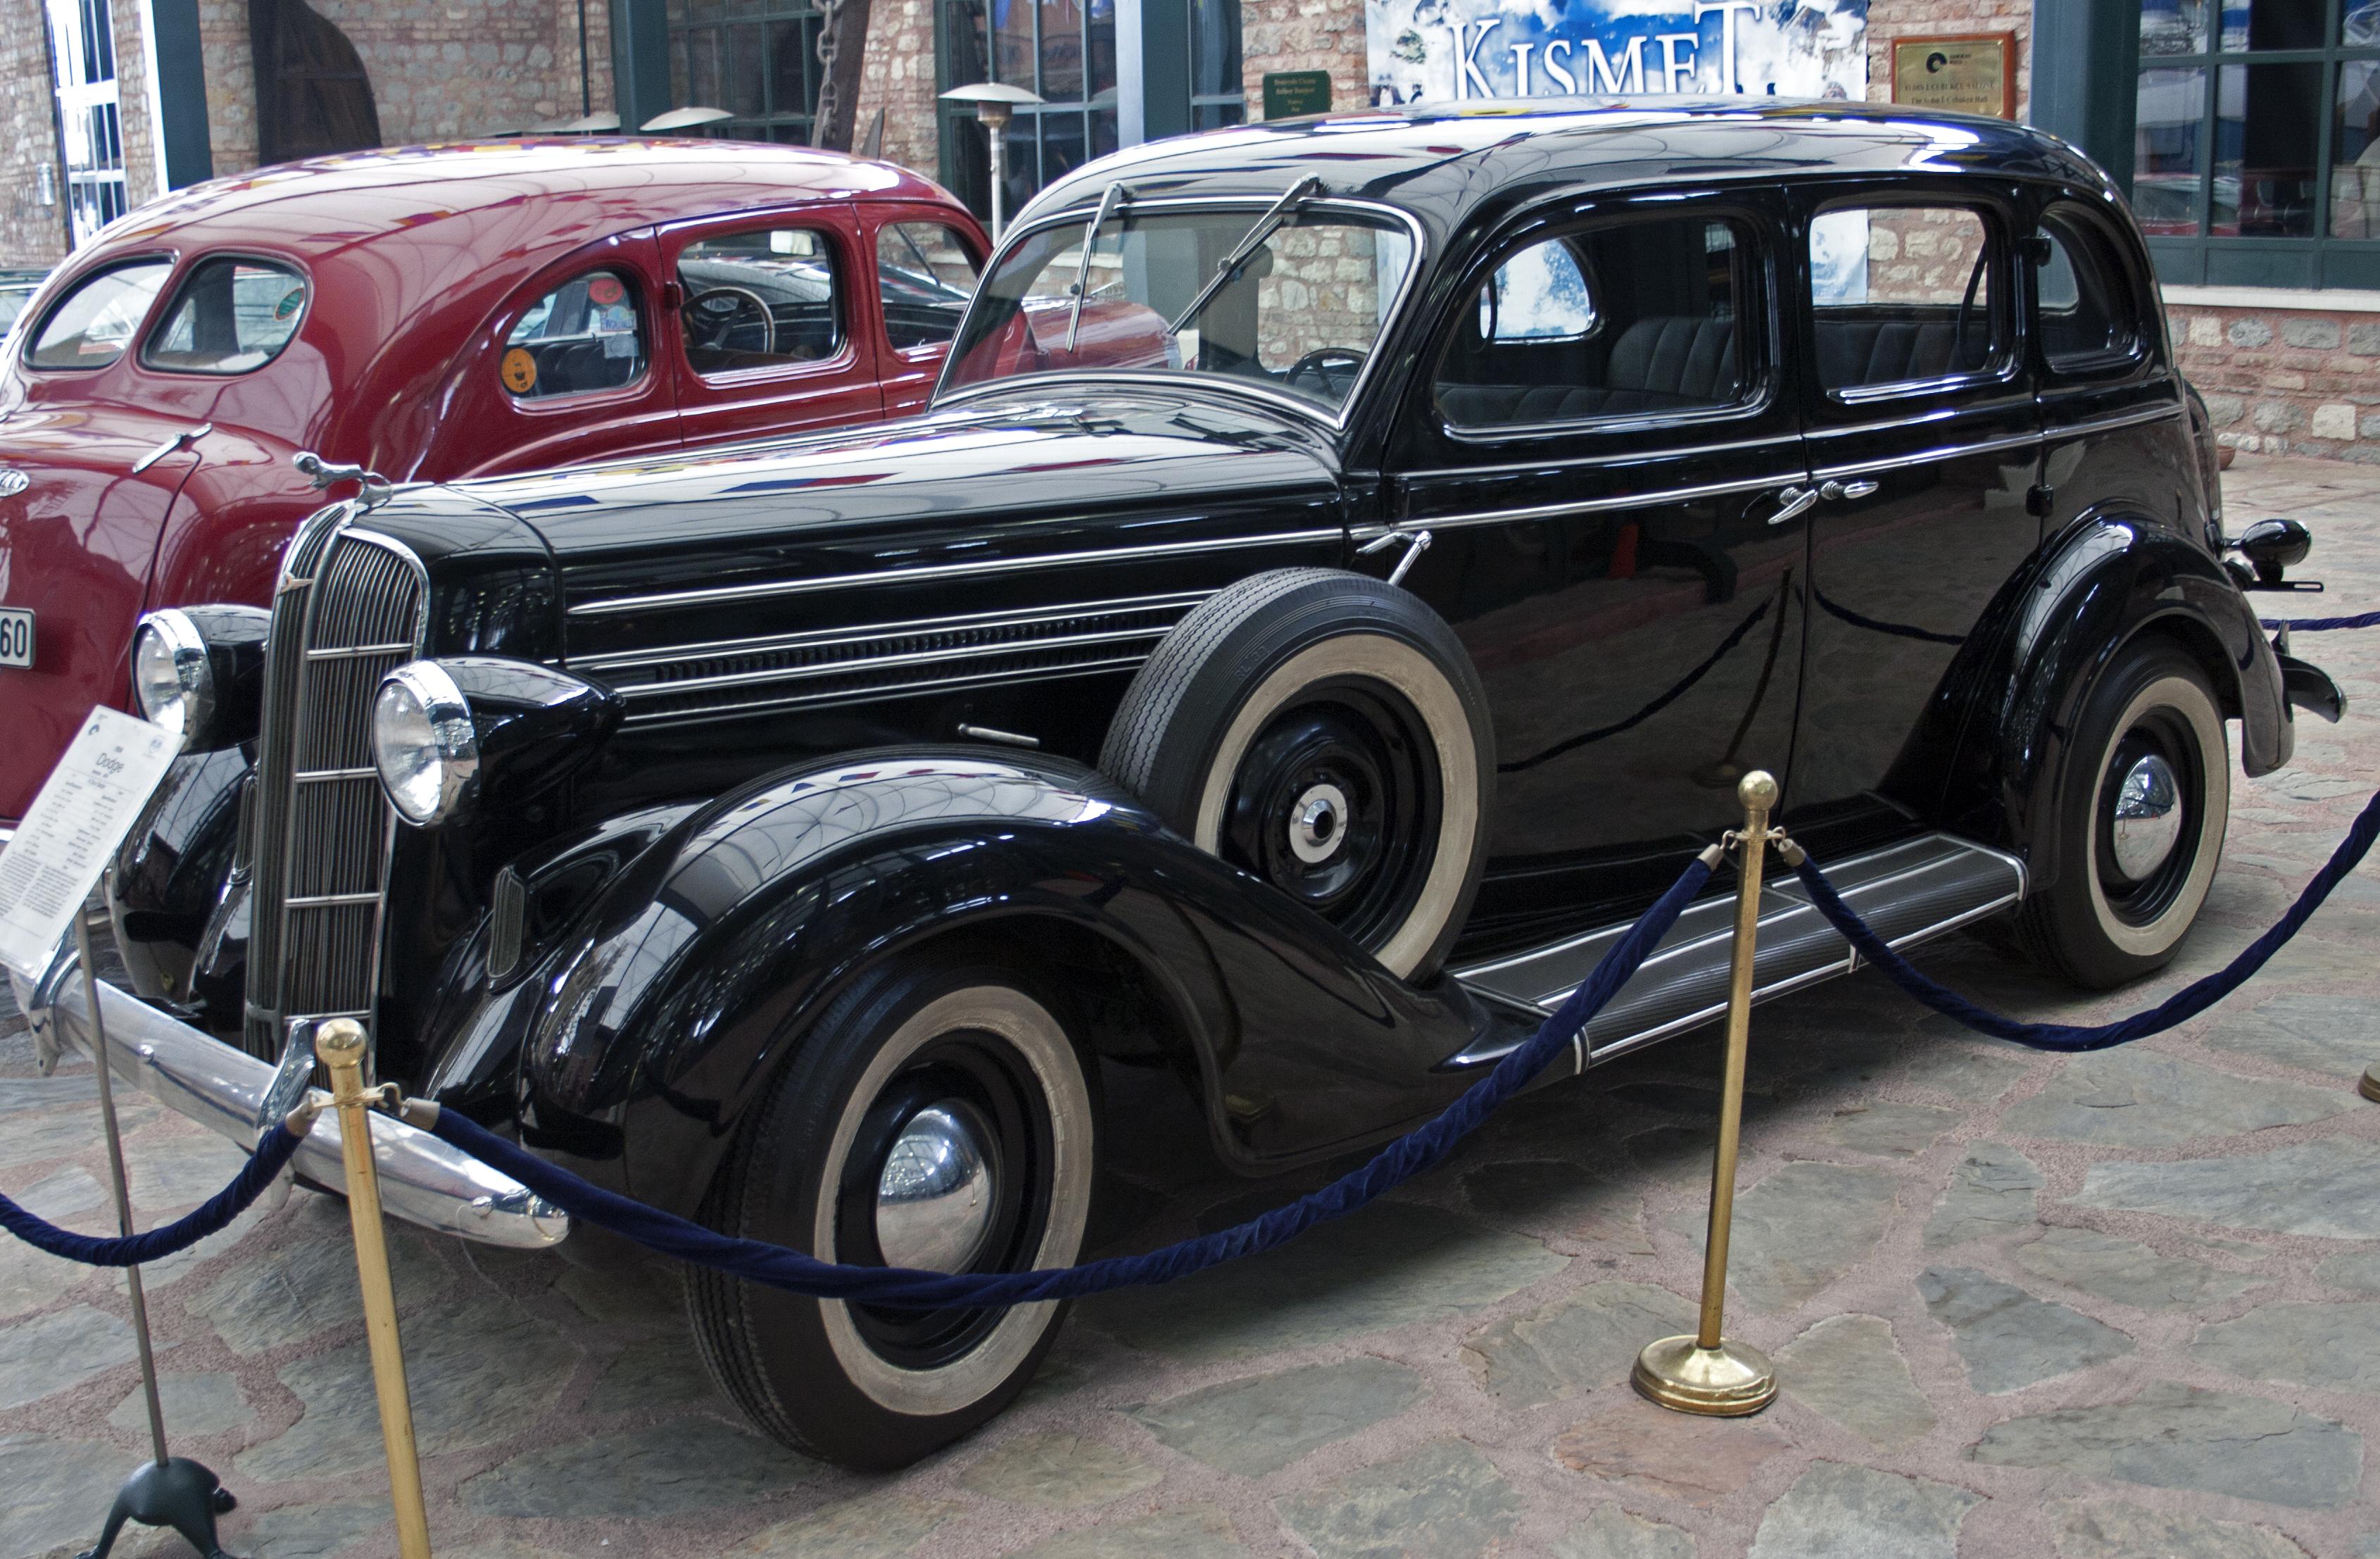 Used Car Loan >> File:1936 Dodge Six Touring Sedan Istanbul.jpg - Wikimedia ...